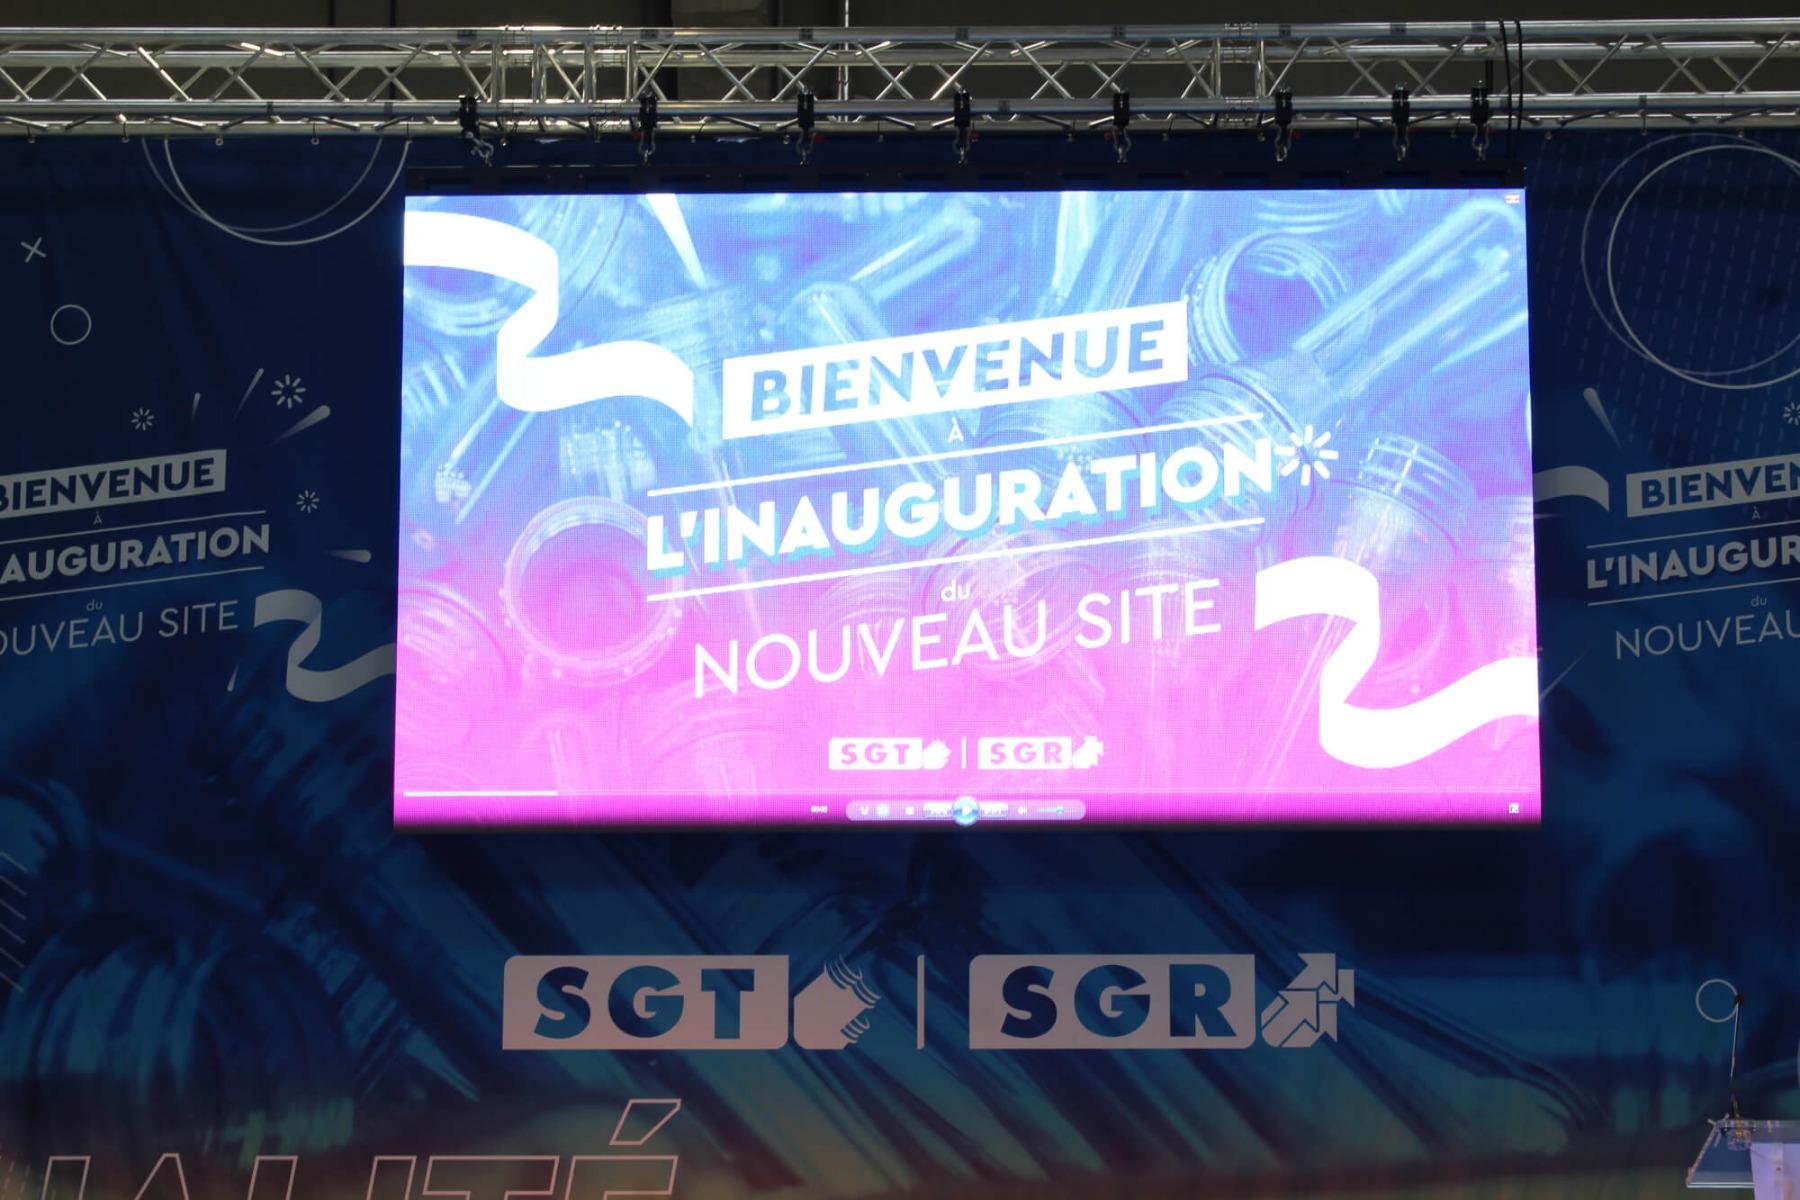 Ecran LED KINESIK pour prestation audiovisuelle : inauguration